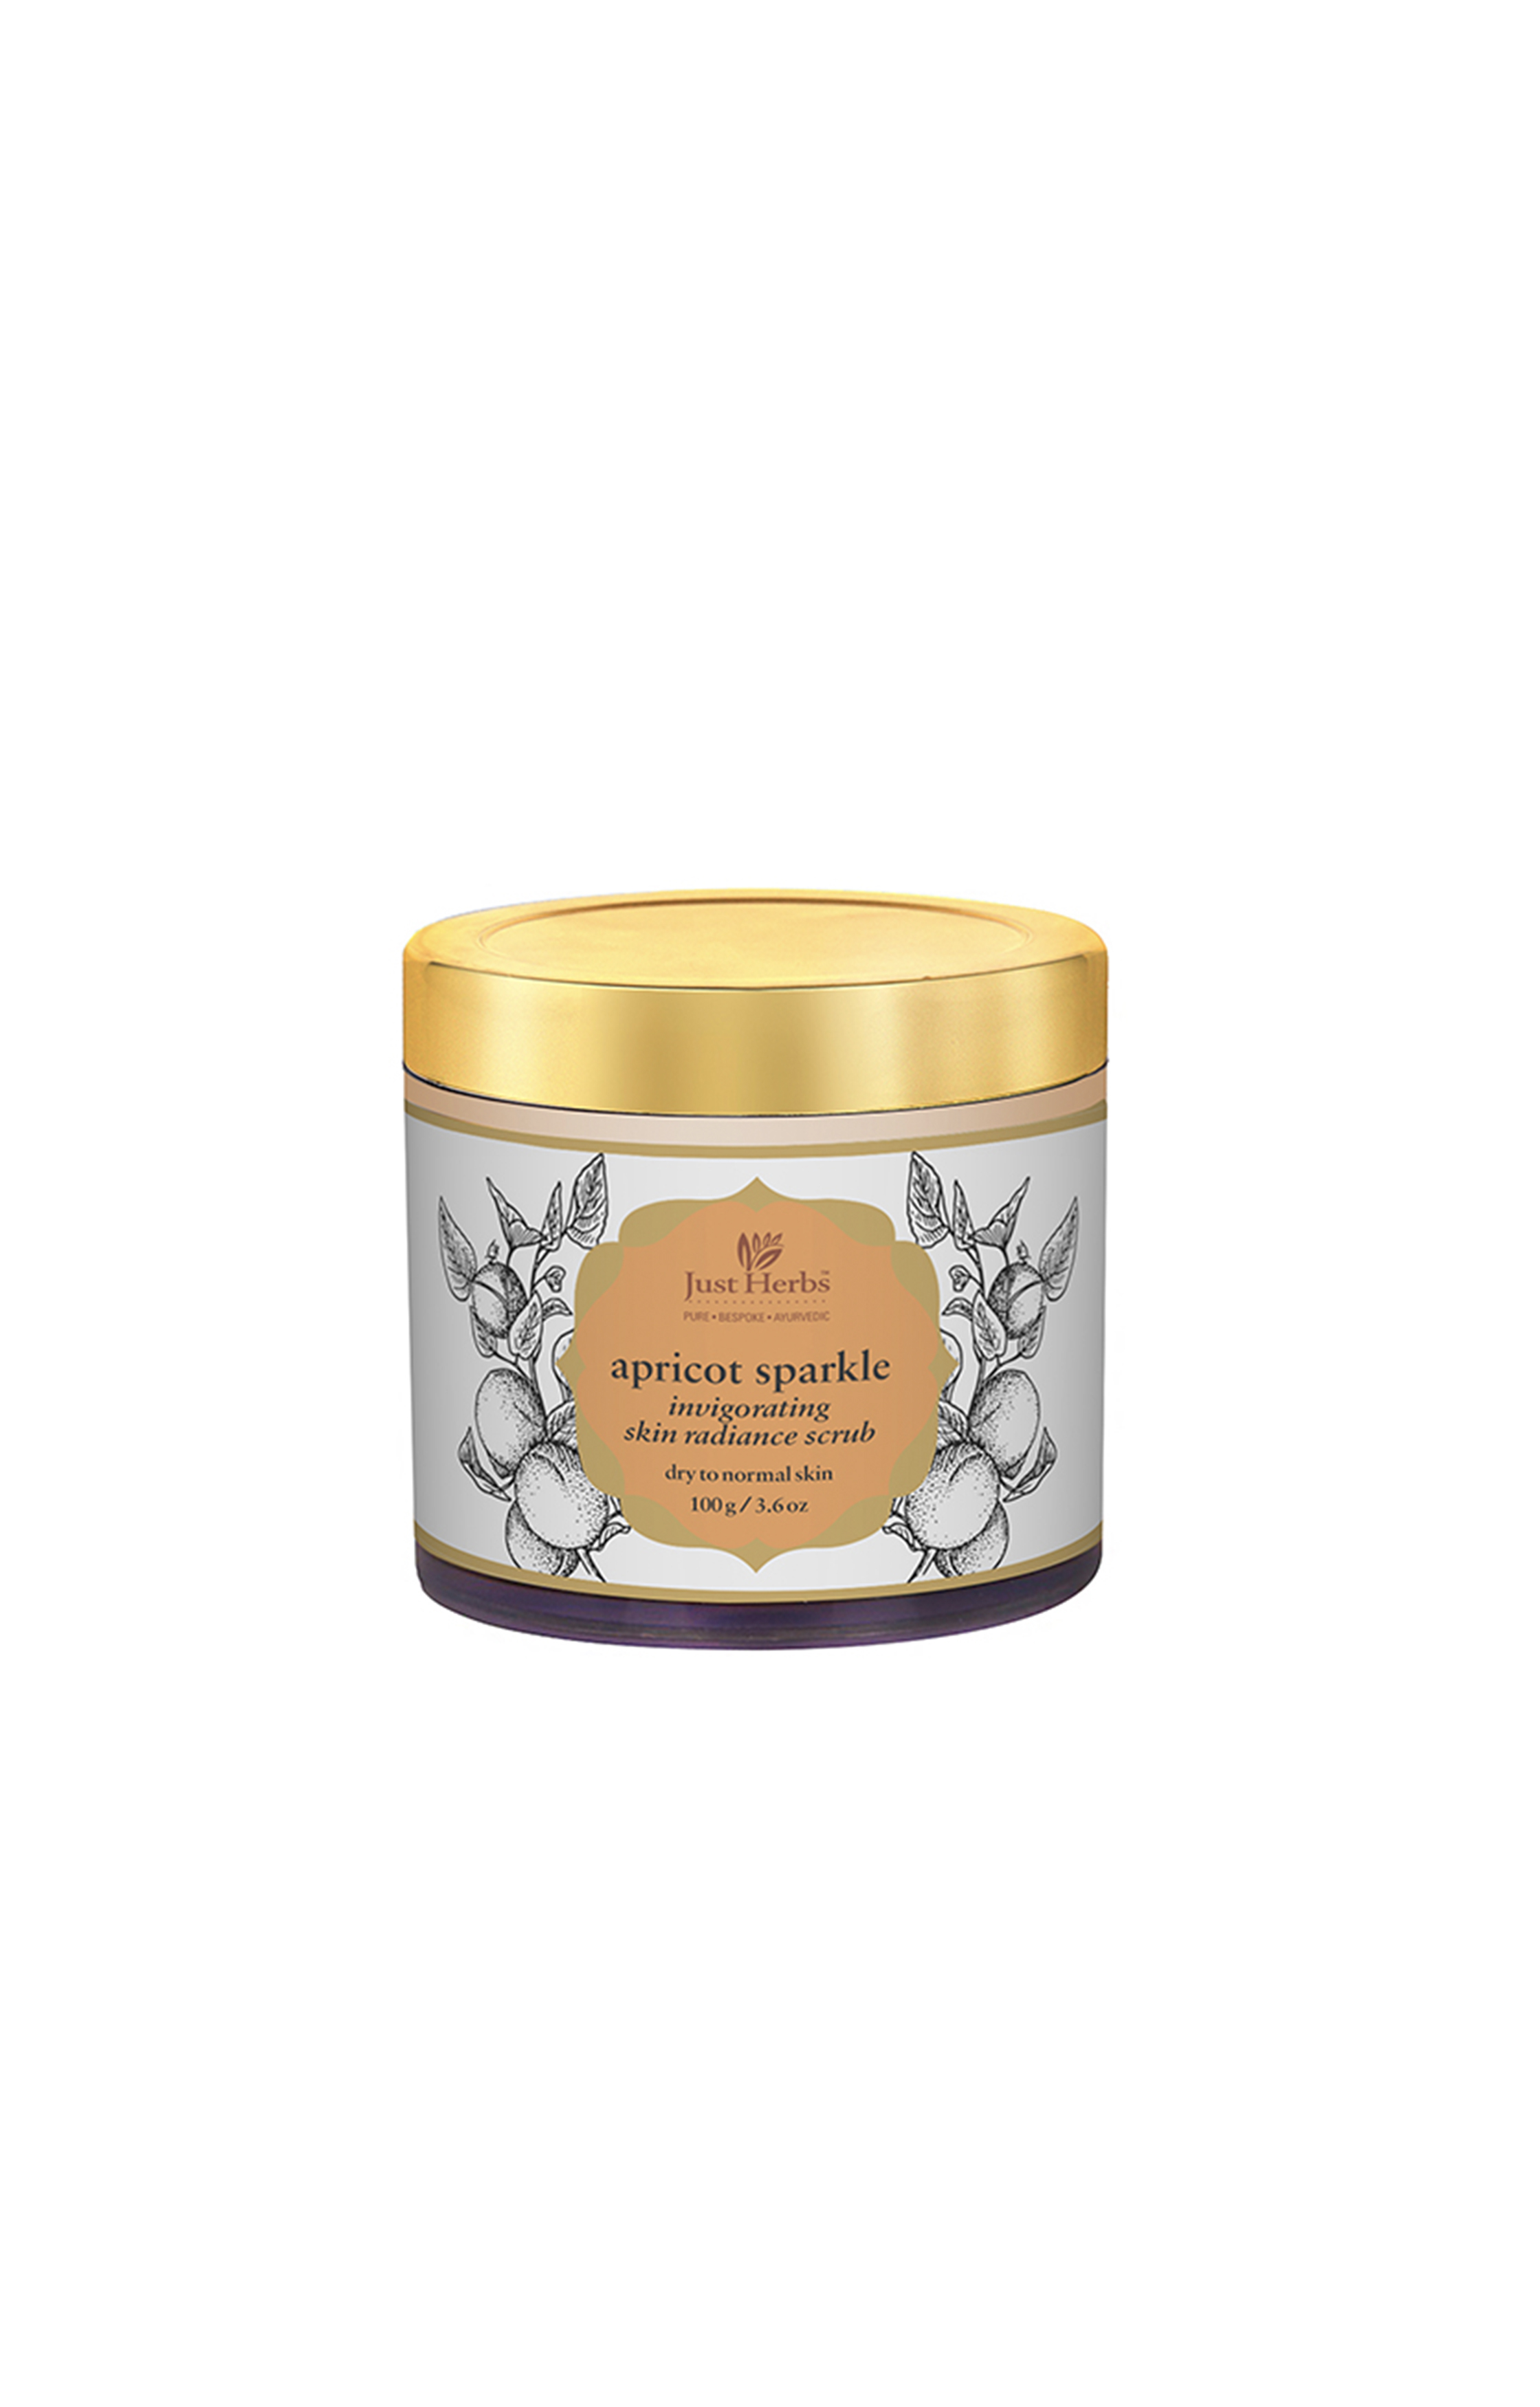 Just Herbs   Apricot Sparkle Invigorating Skin Radiance Scrub